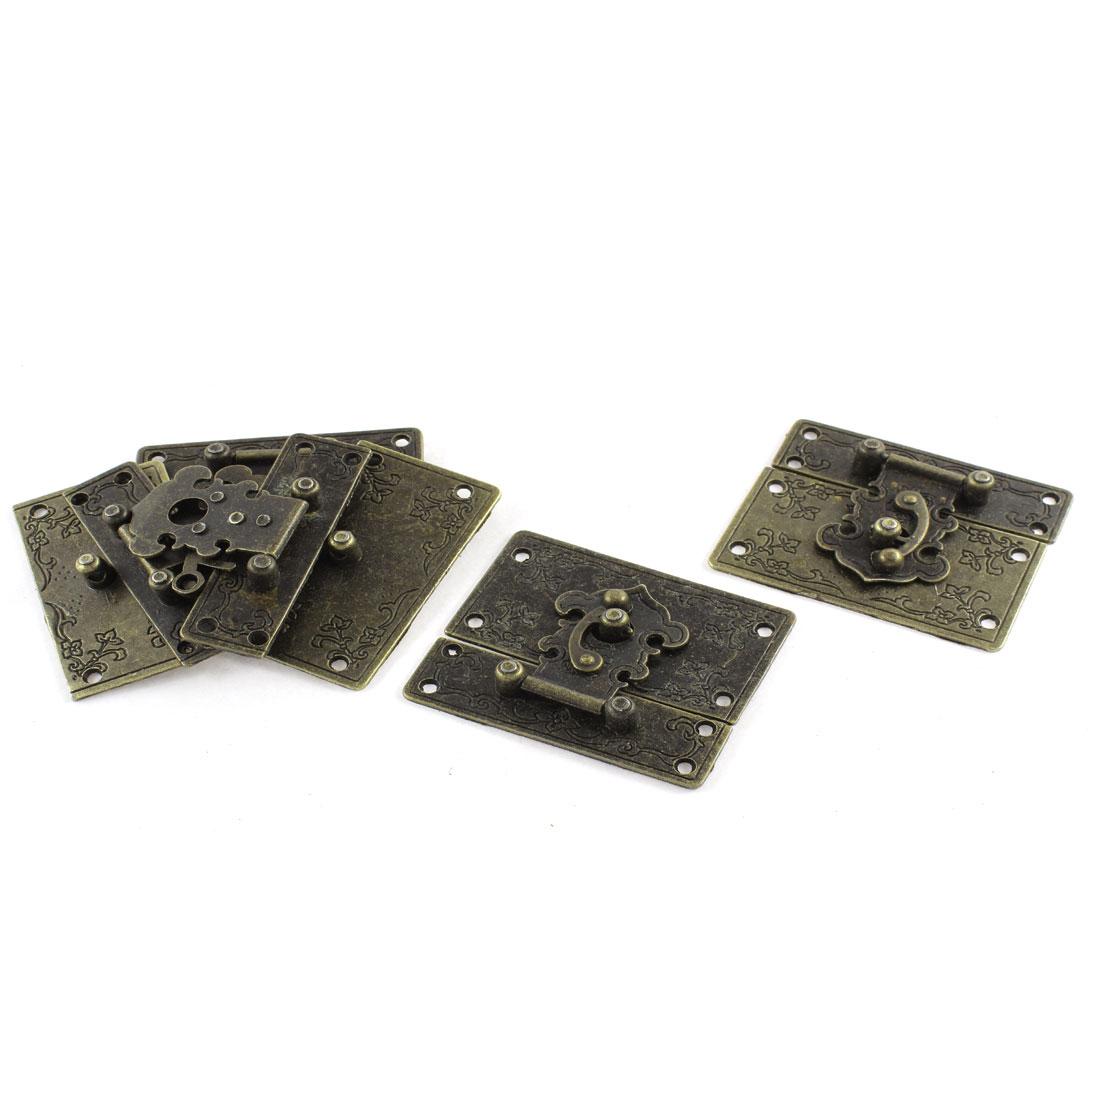 5pcs 67mmx58mm Vintage Style Jewelry Box Hasp Latch Lock w Screws